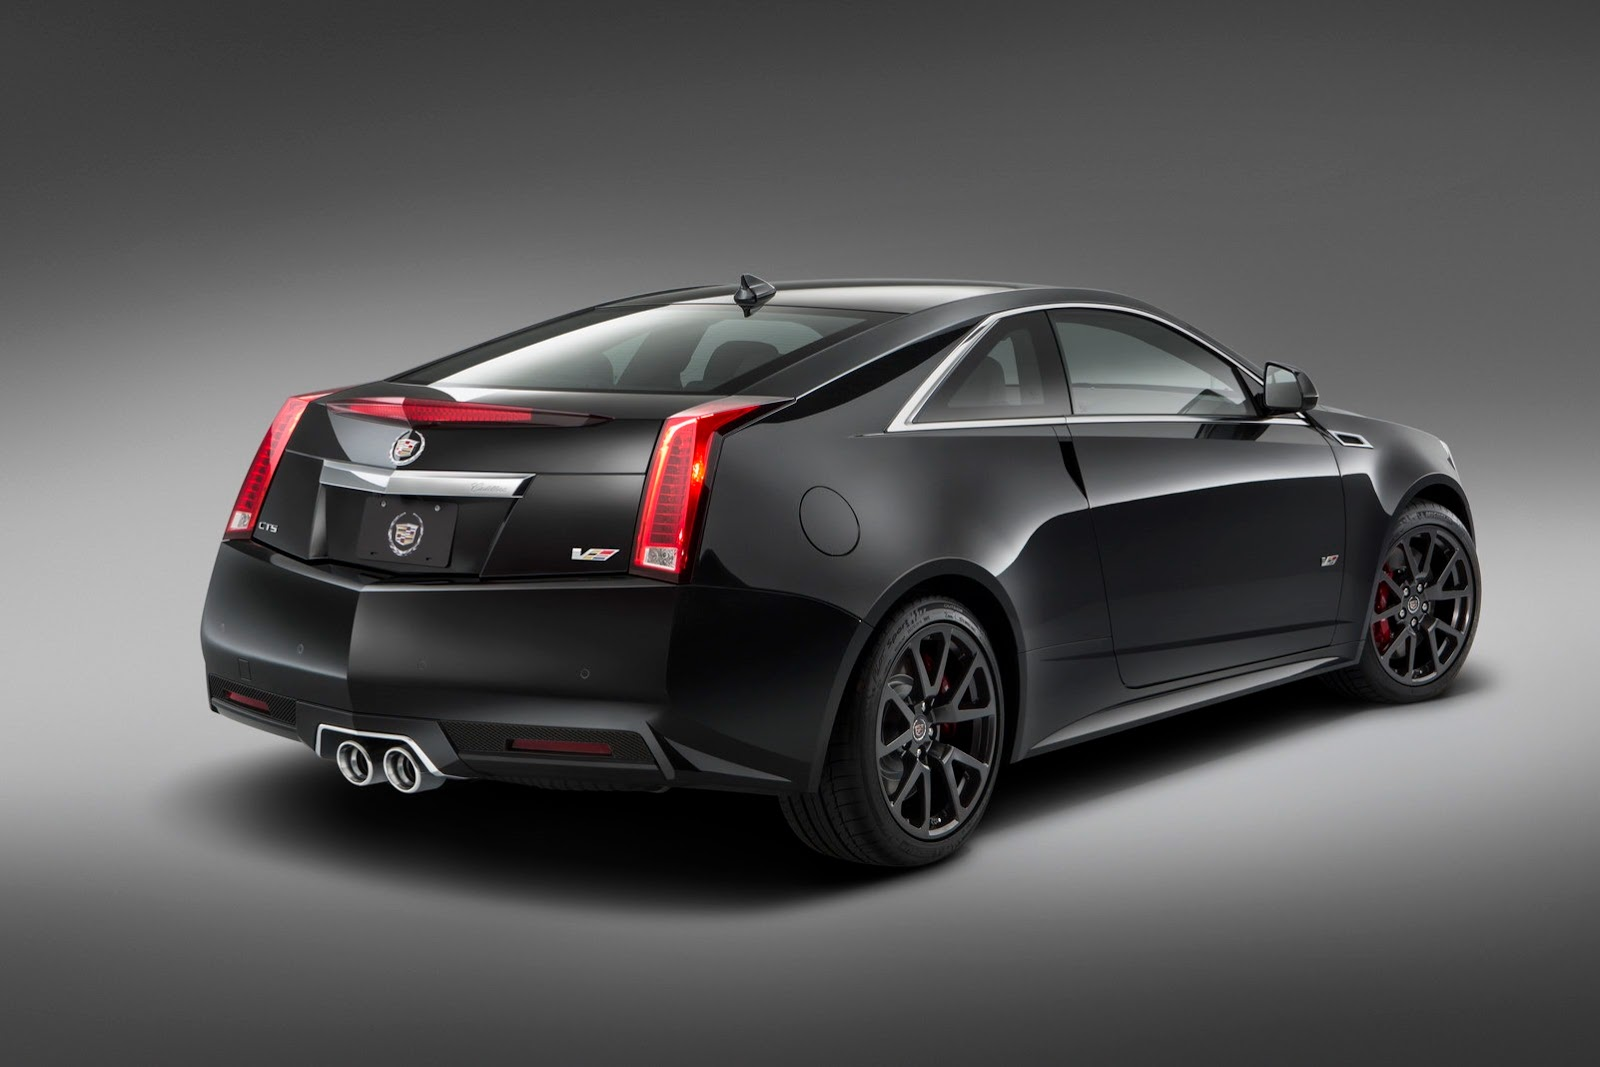 2010 - [Cadillac] CTS-V Coupé - Page 3 2015-Cadillac-CTSV-Coupe-2%25255B3%25255D